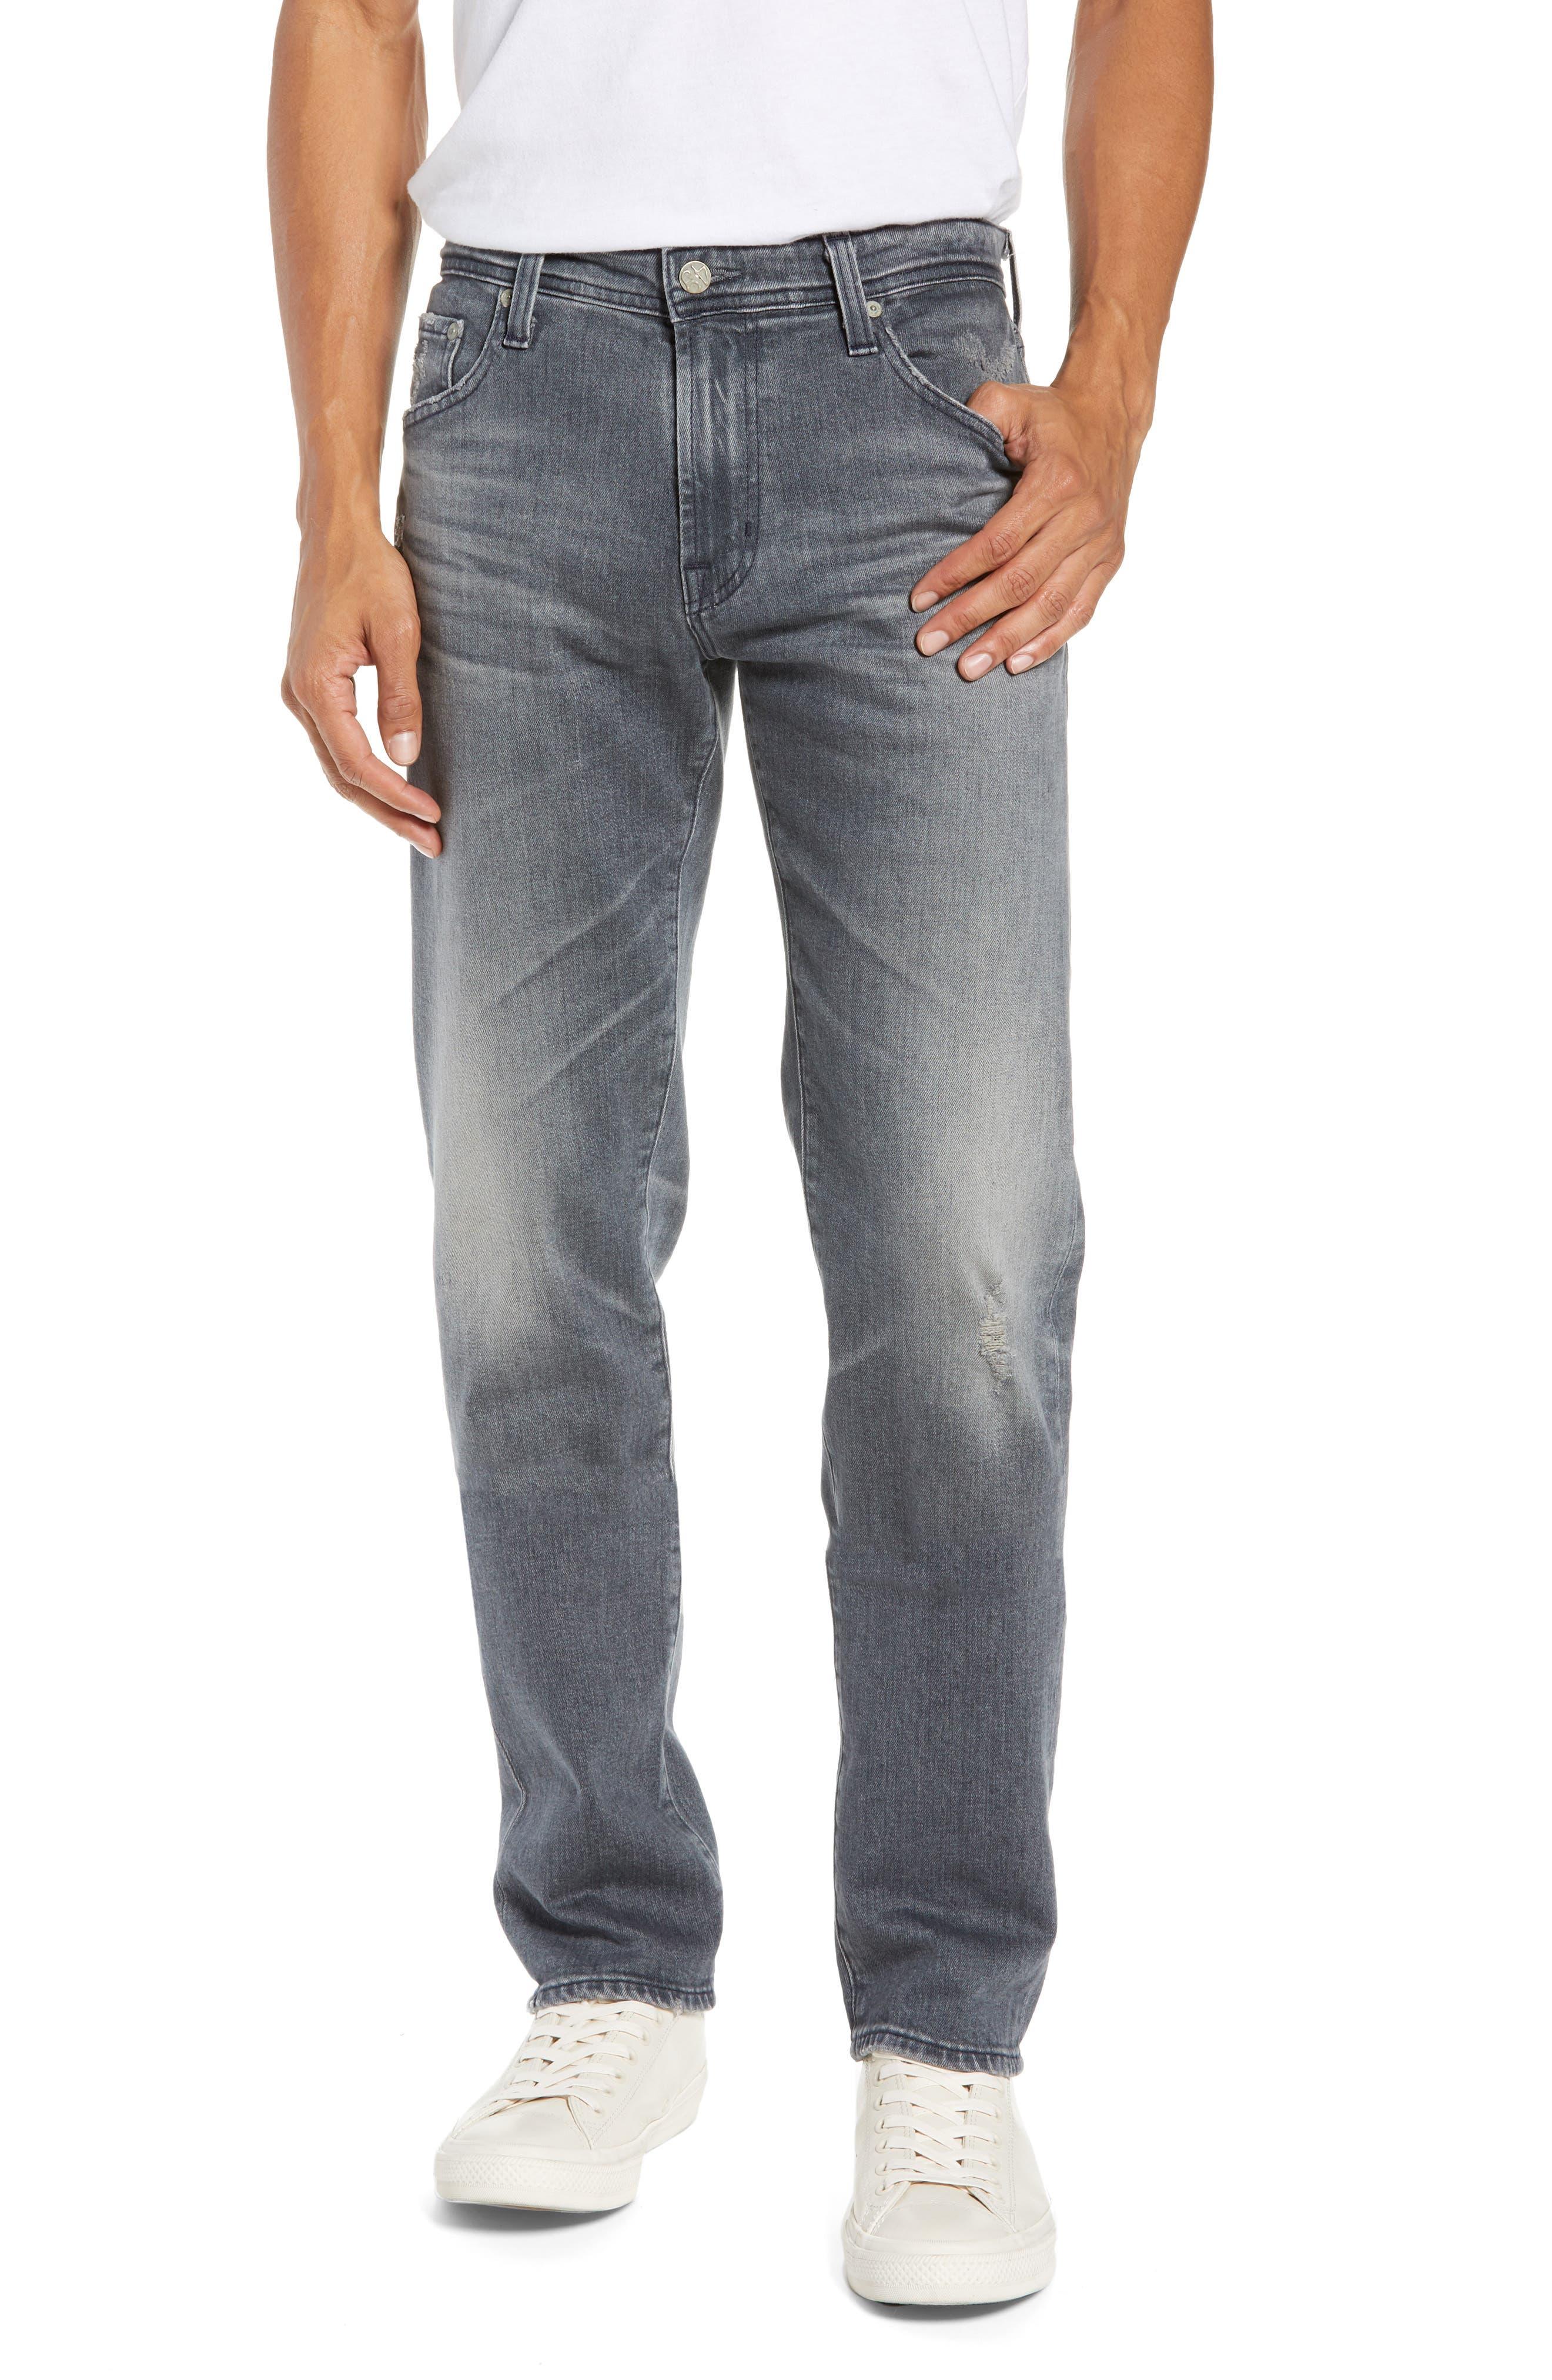 Tellis Slim Fit Jeans,                             Main thumbnail 1, color,                             8 YEARS CONJURE